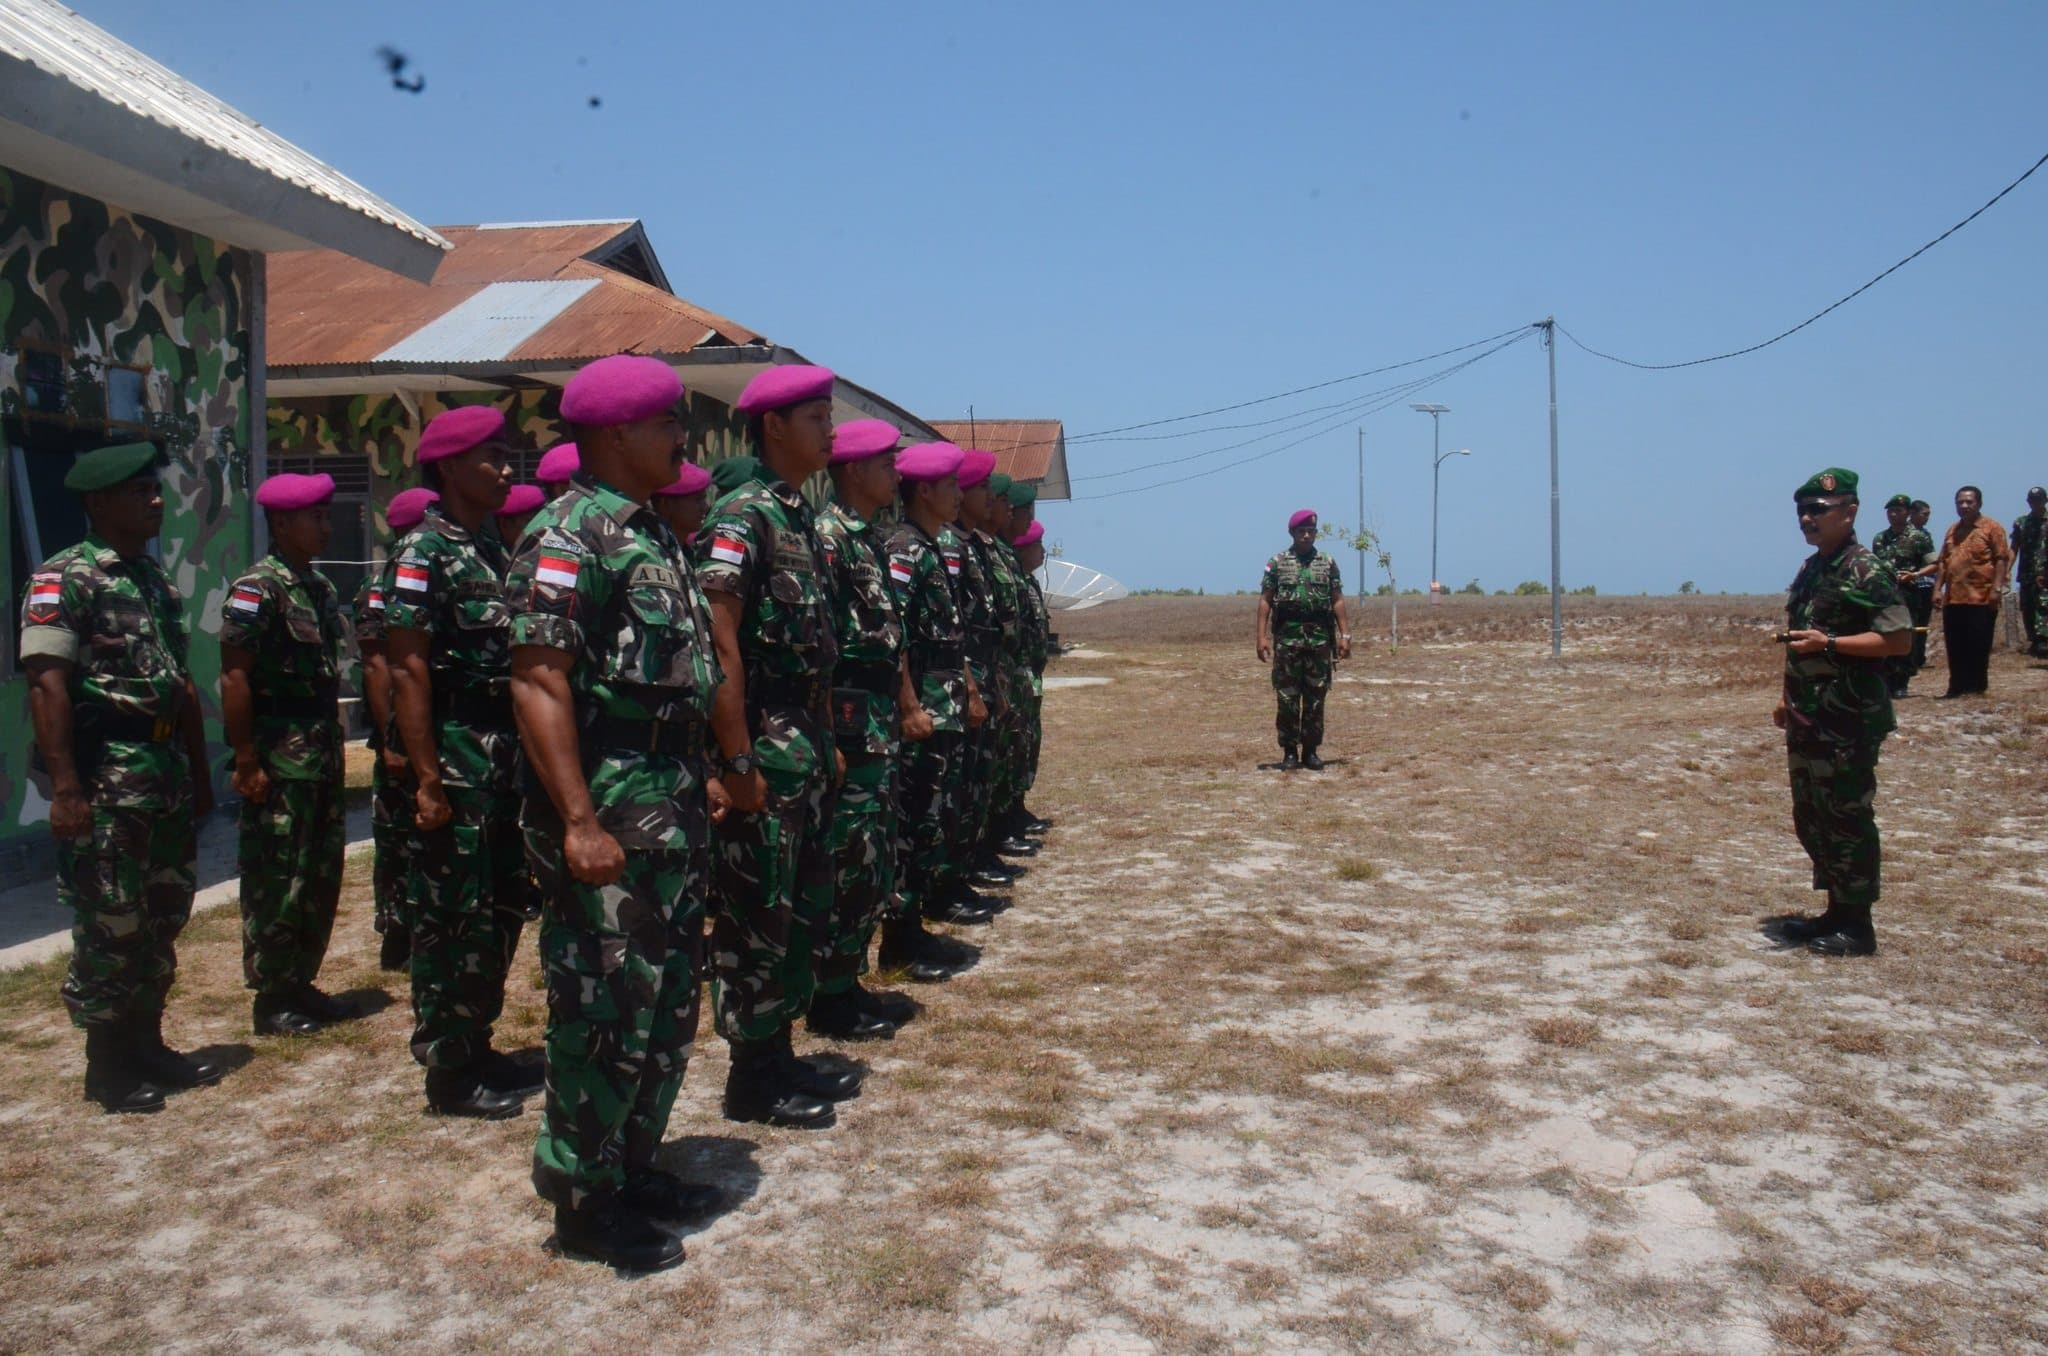 Danrem 161/Wira Sakti Selaku Dankolakops Pengamanan Pulau Terluar Tinjau Pulau Ndana Rote